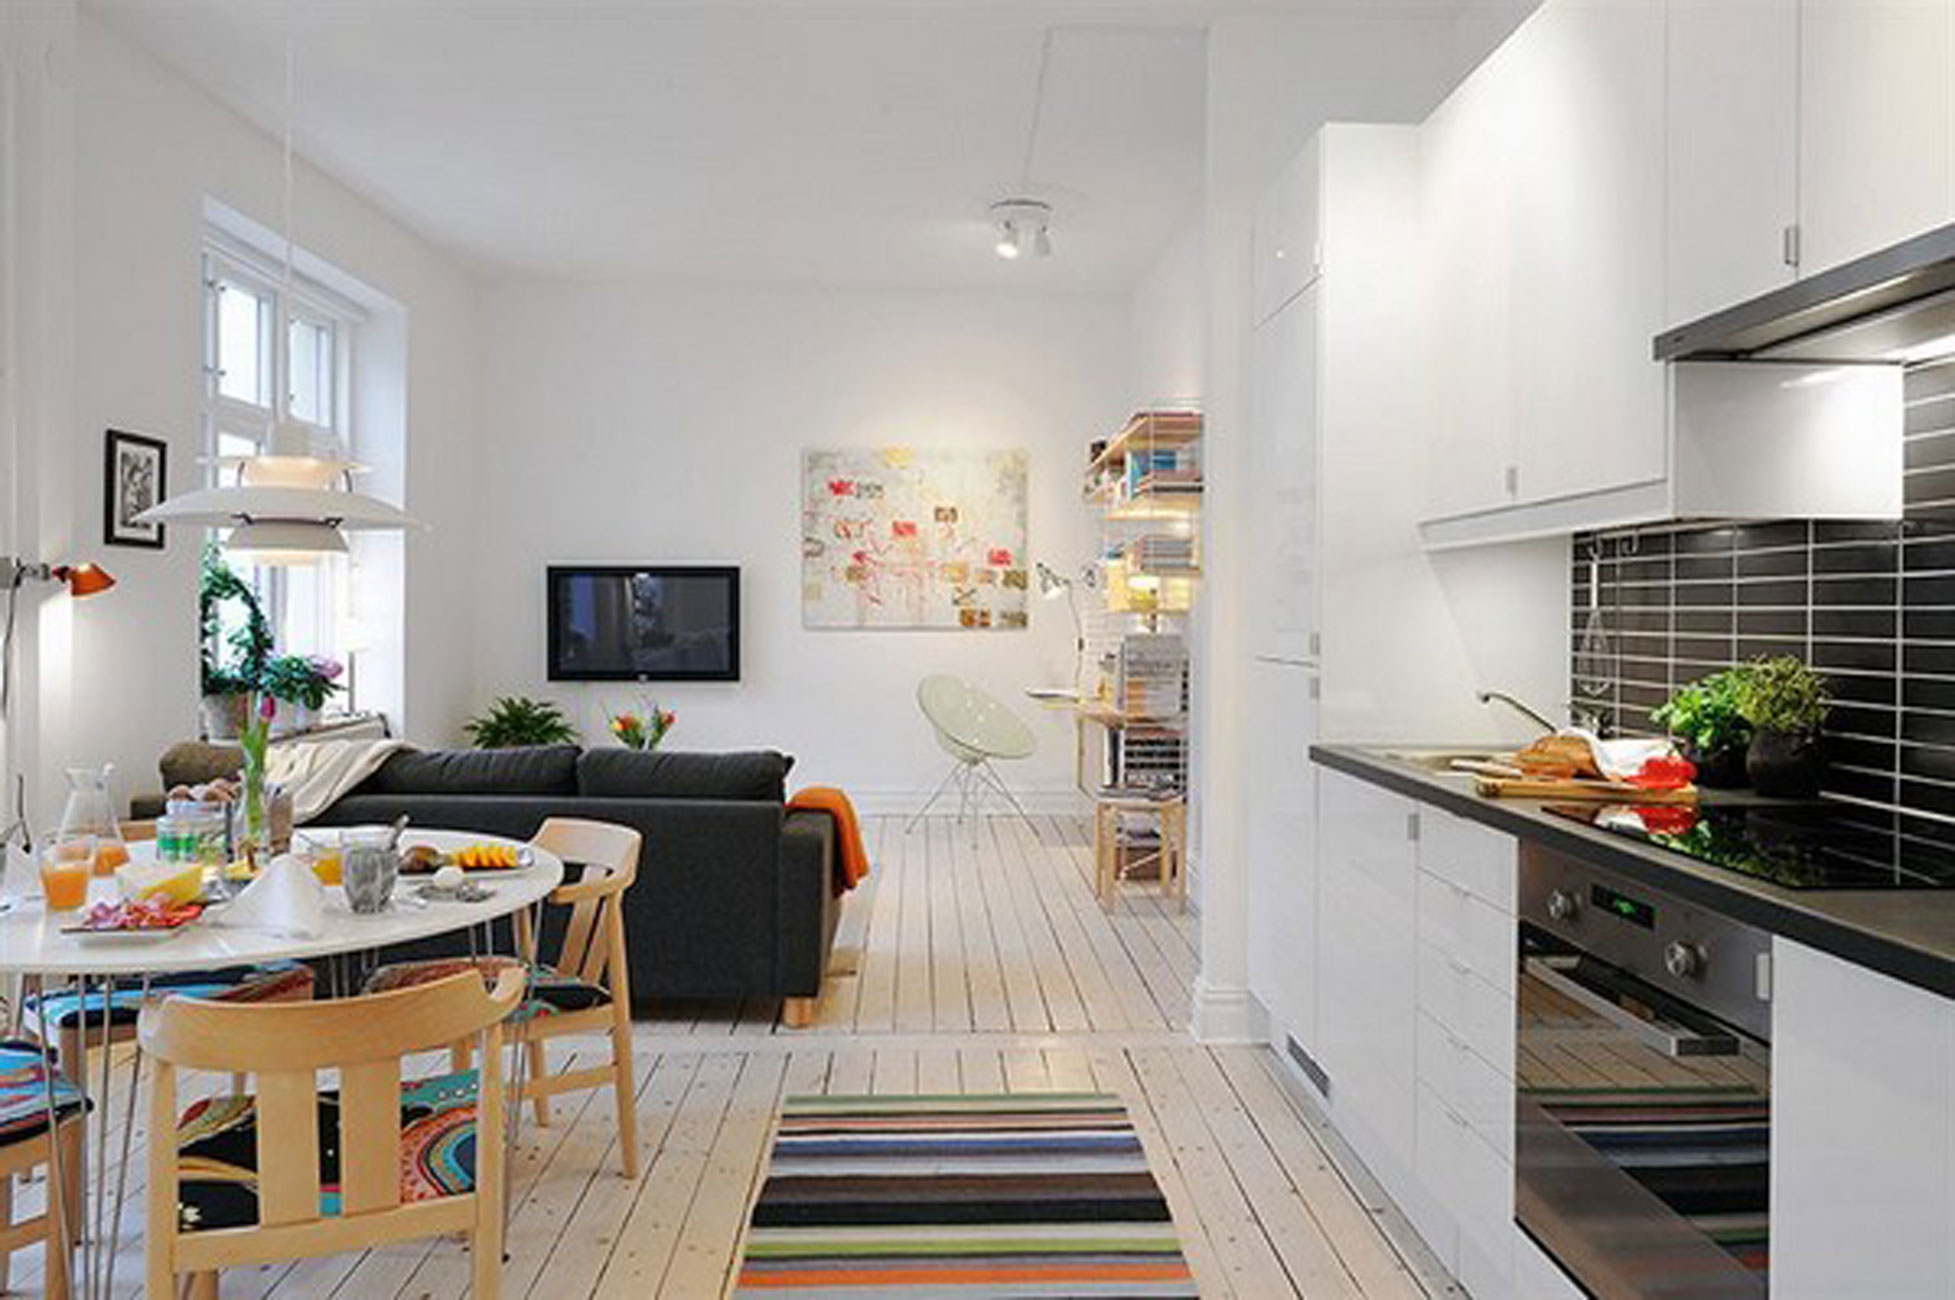 Идеи обустройства квартиры фото